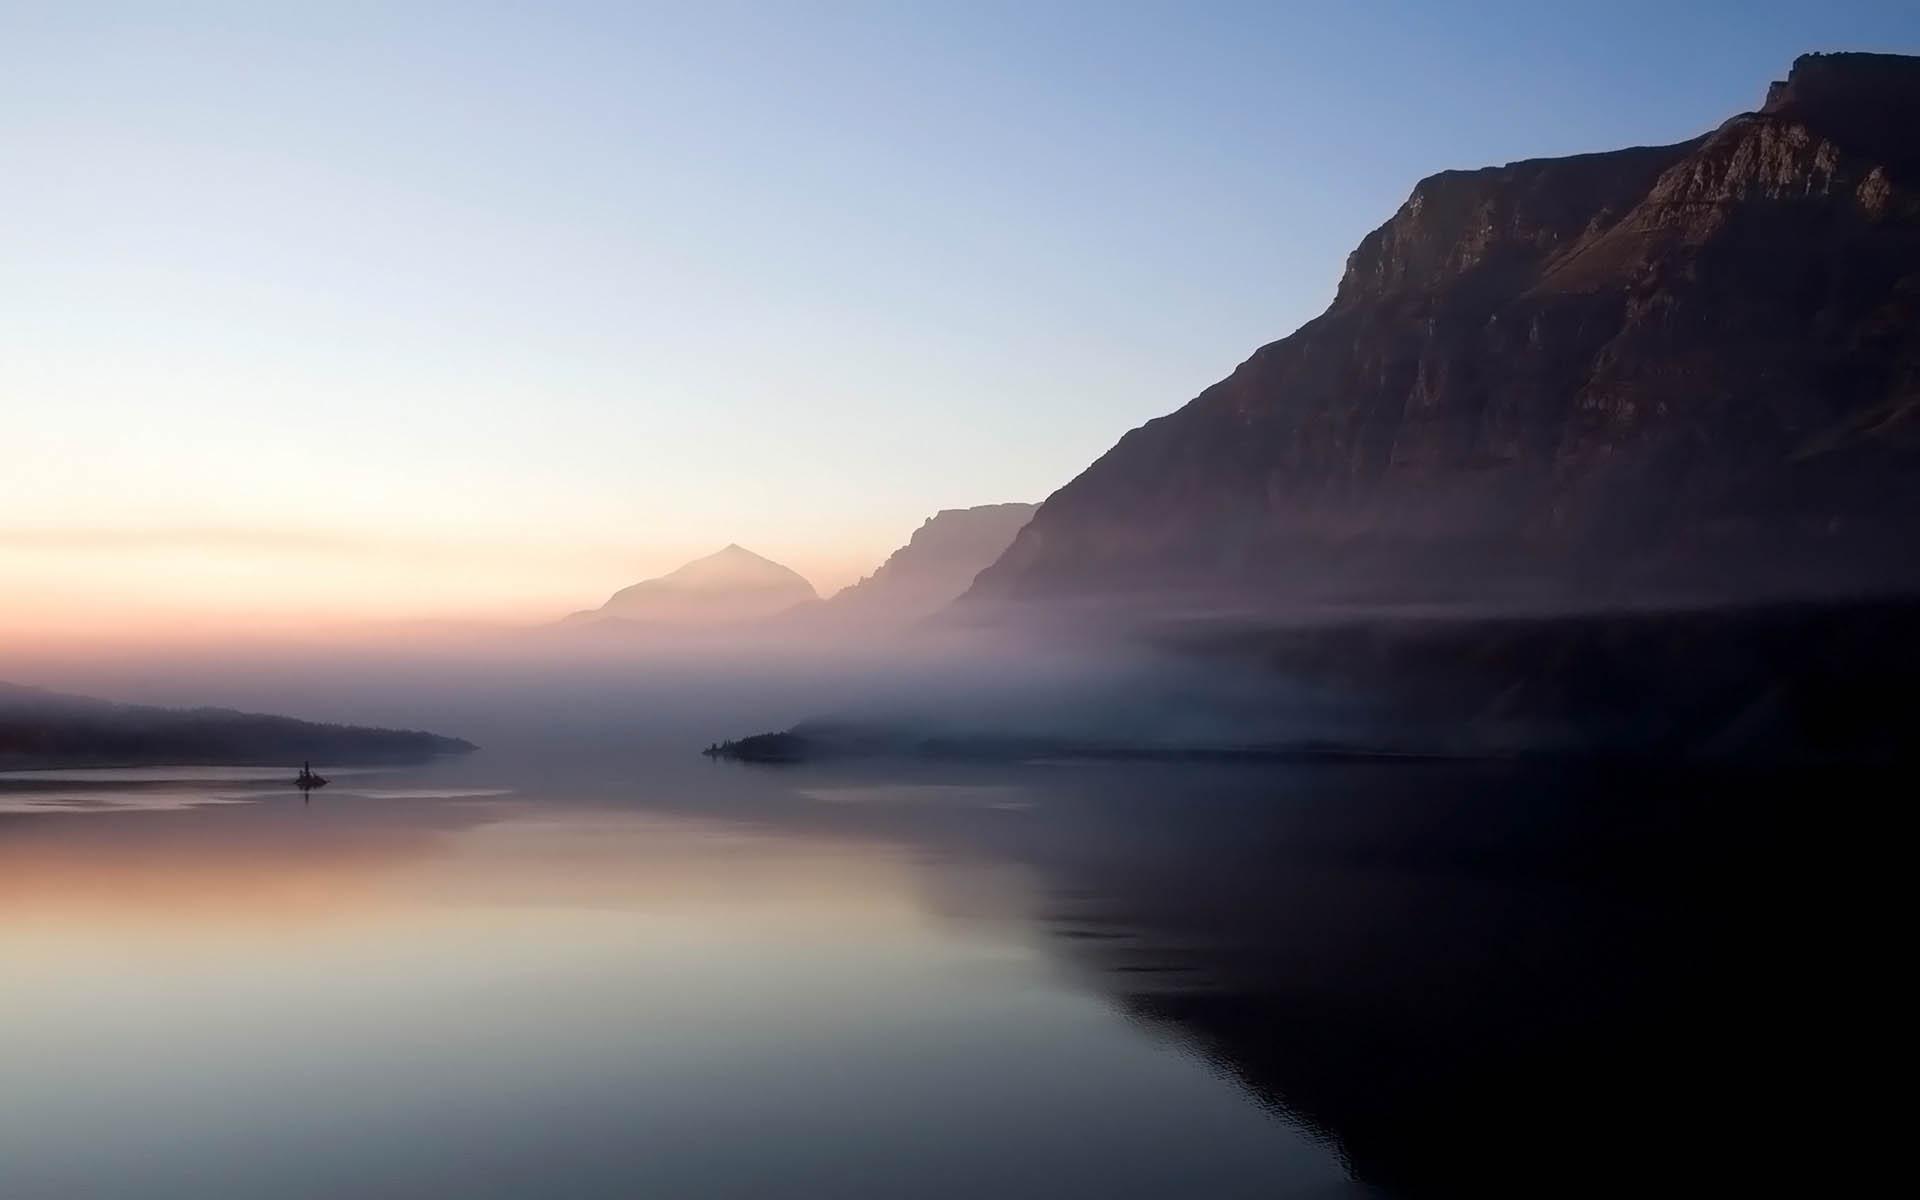 lake mist wallpaper 33767